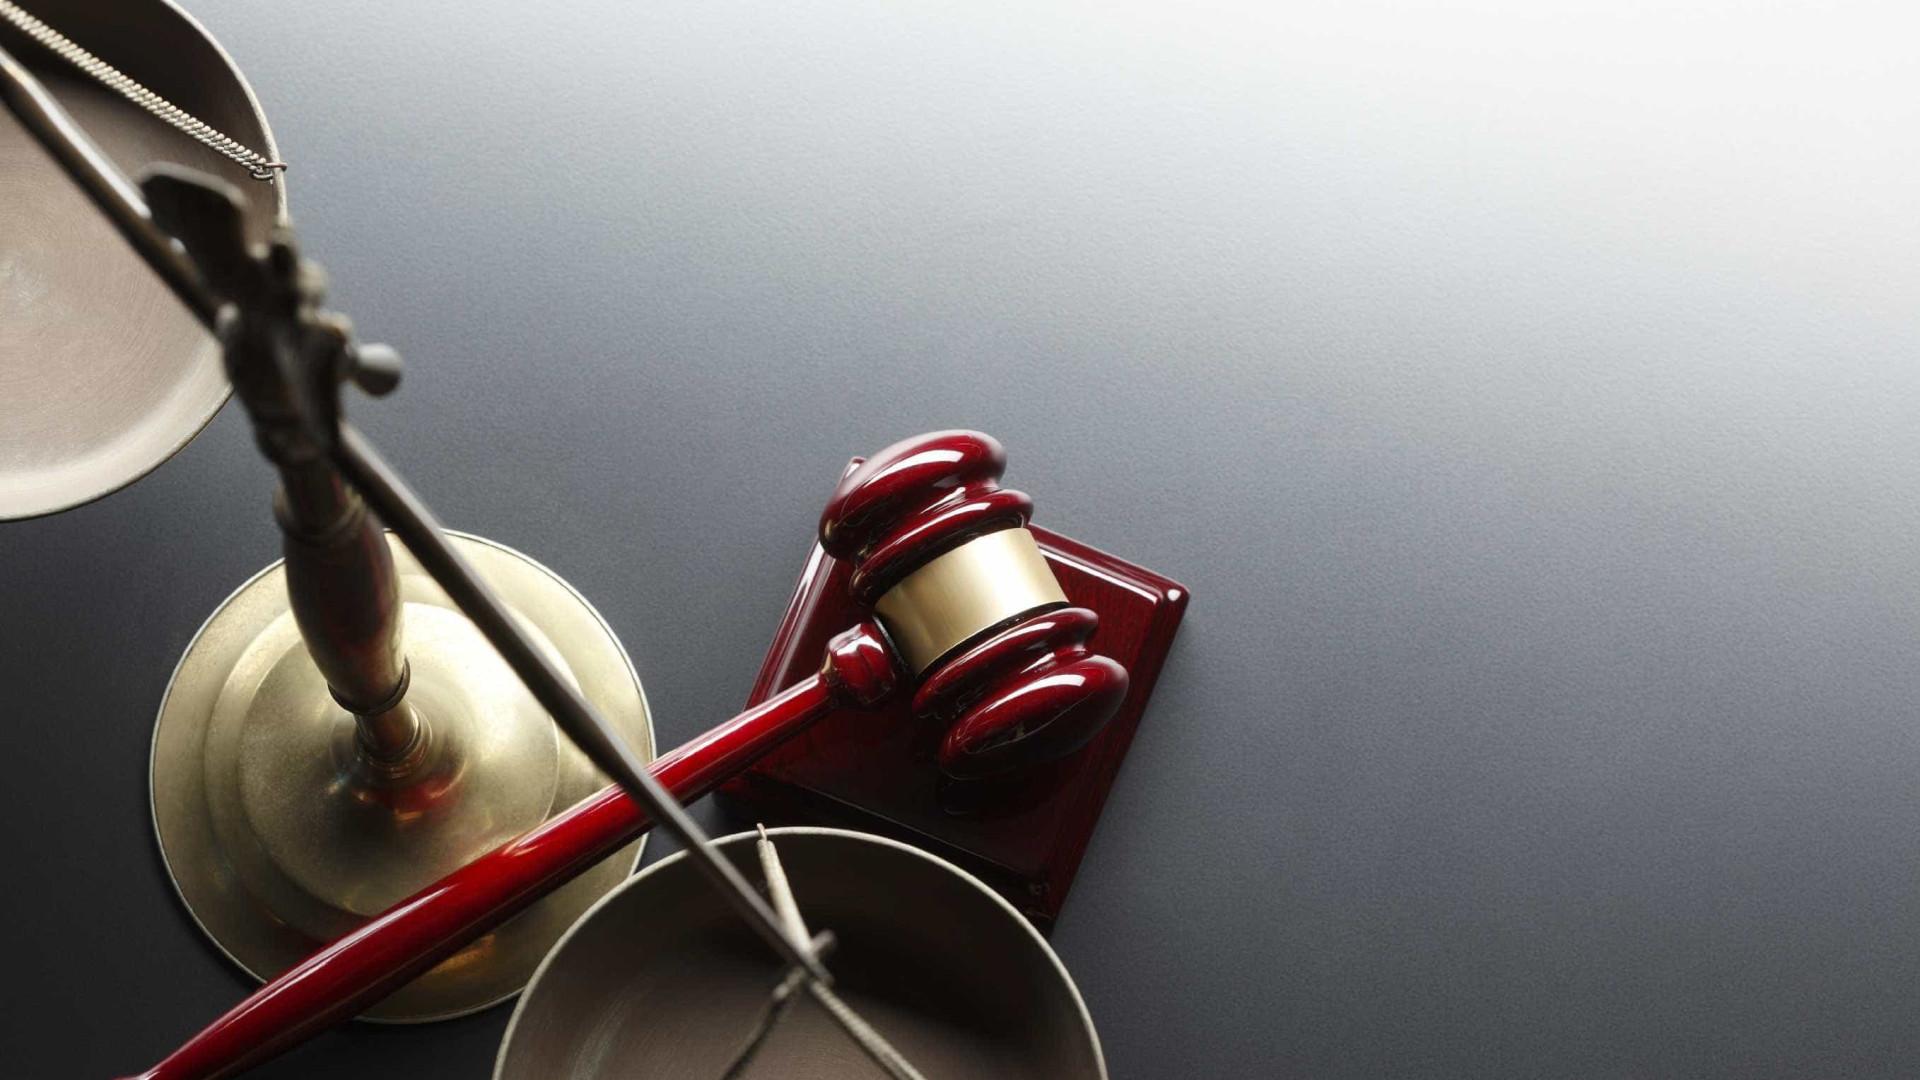 Tribunal filipino condena a prisão perpétua traficante mexicano